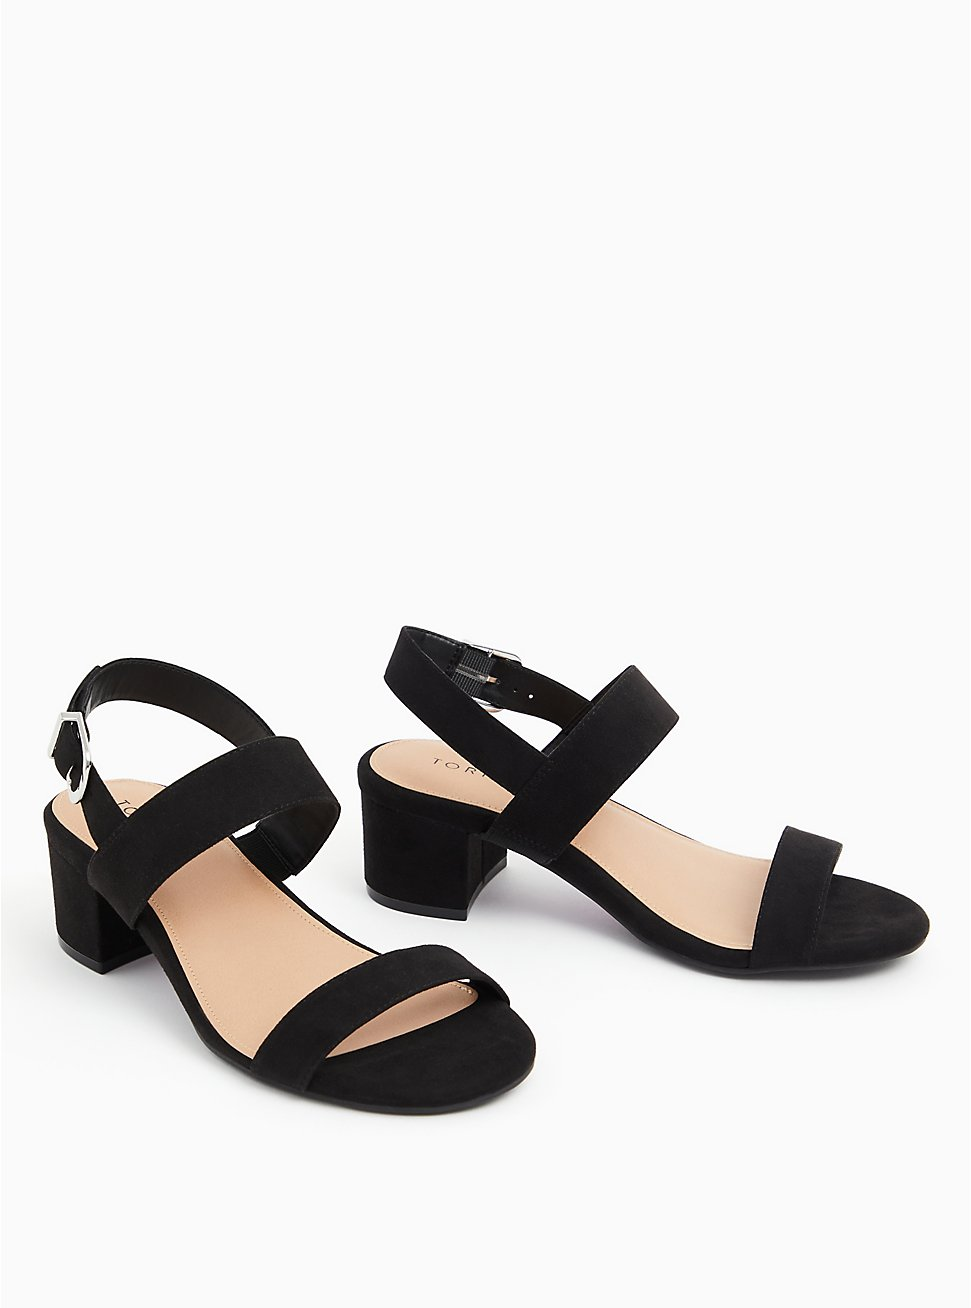 Black Faux Suede Ankle Strap Block Heel (WW), BLACK, hi-res